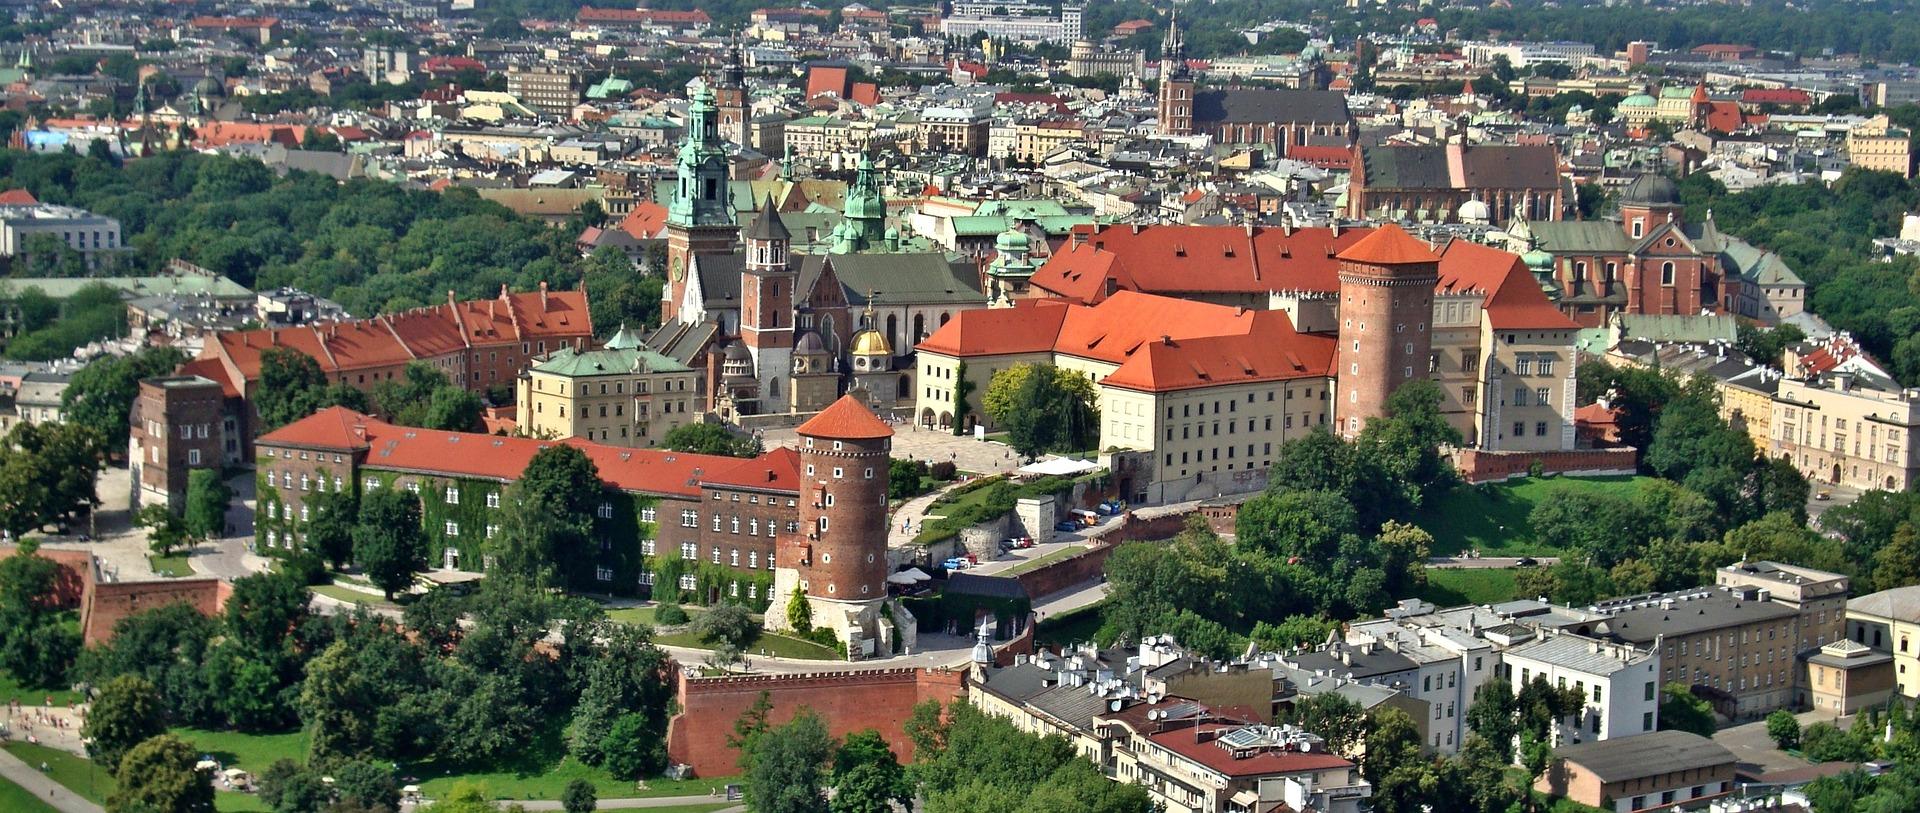 Eurotrip 2020 - Krakow [CANCELLED]